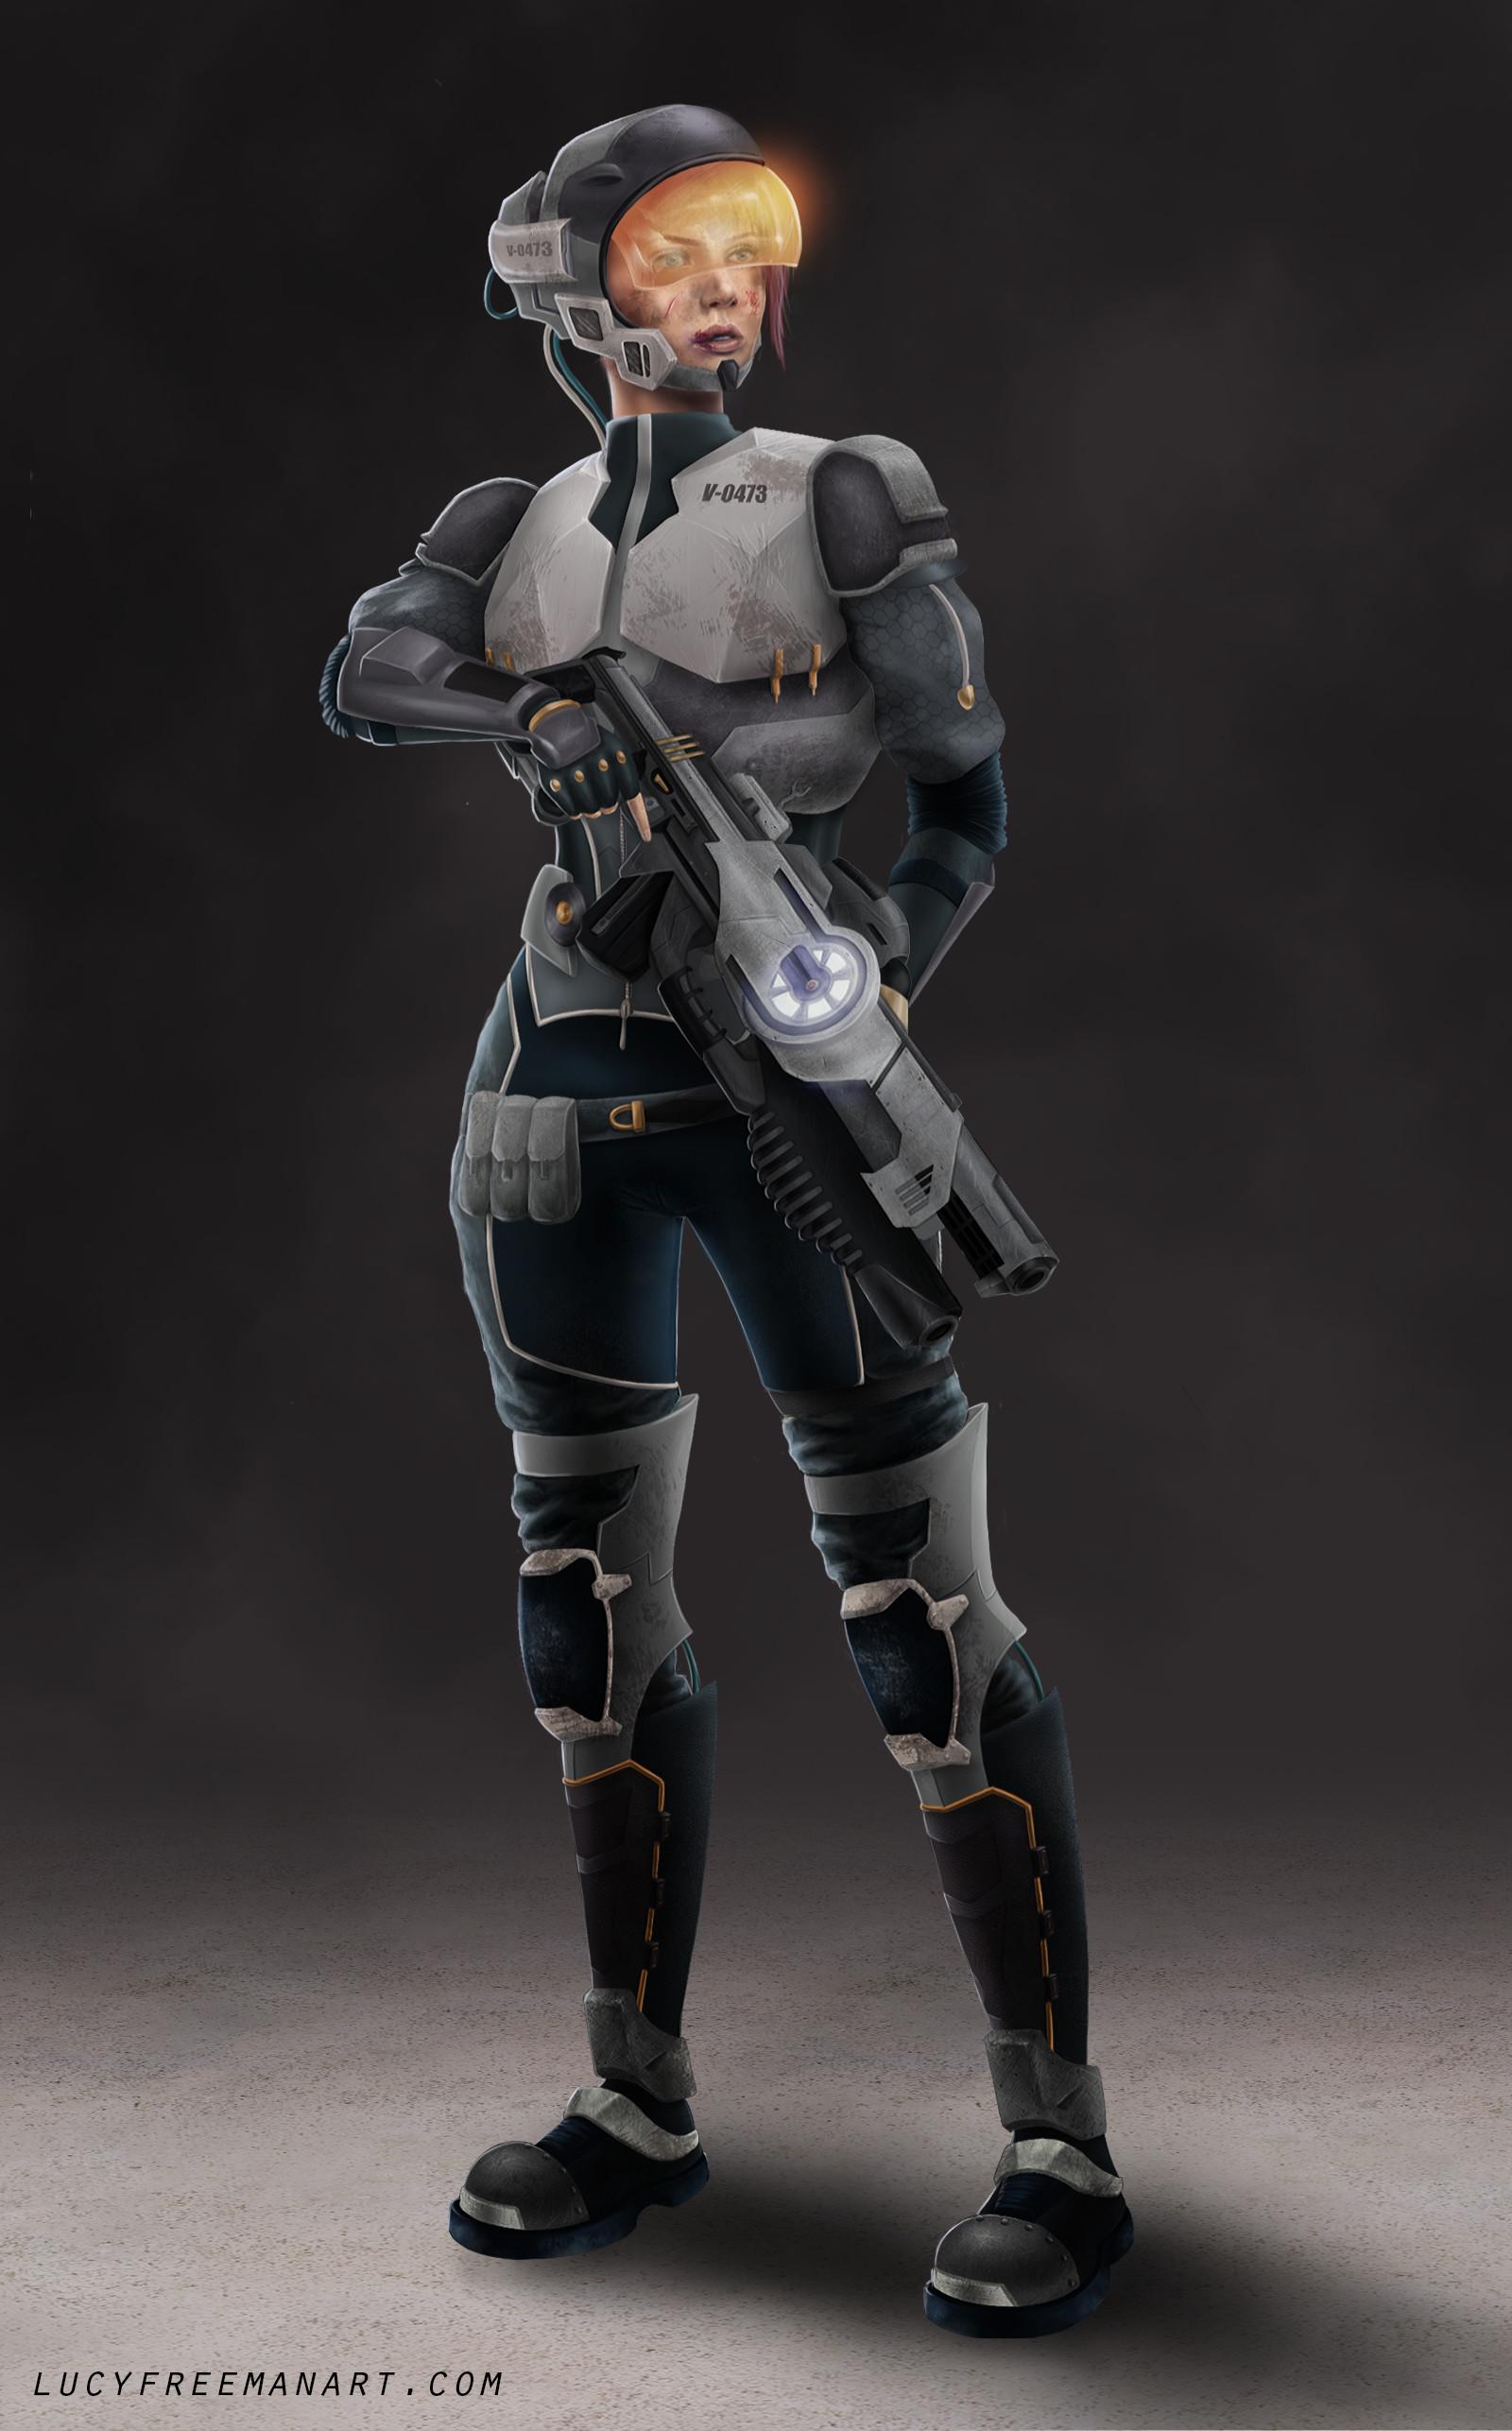 ArtStation - Sci-fi Female Soldier - Vetana, Lucy Freeman